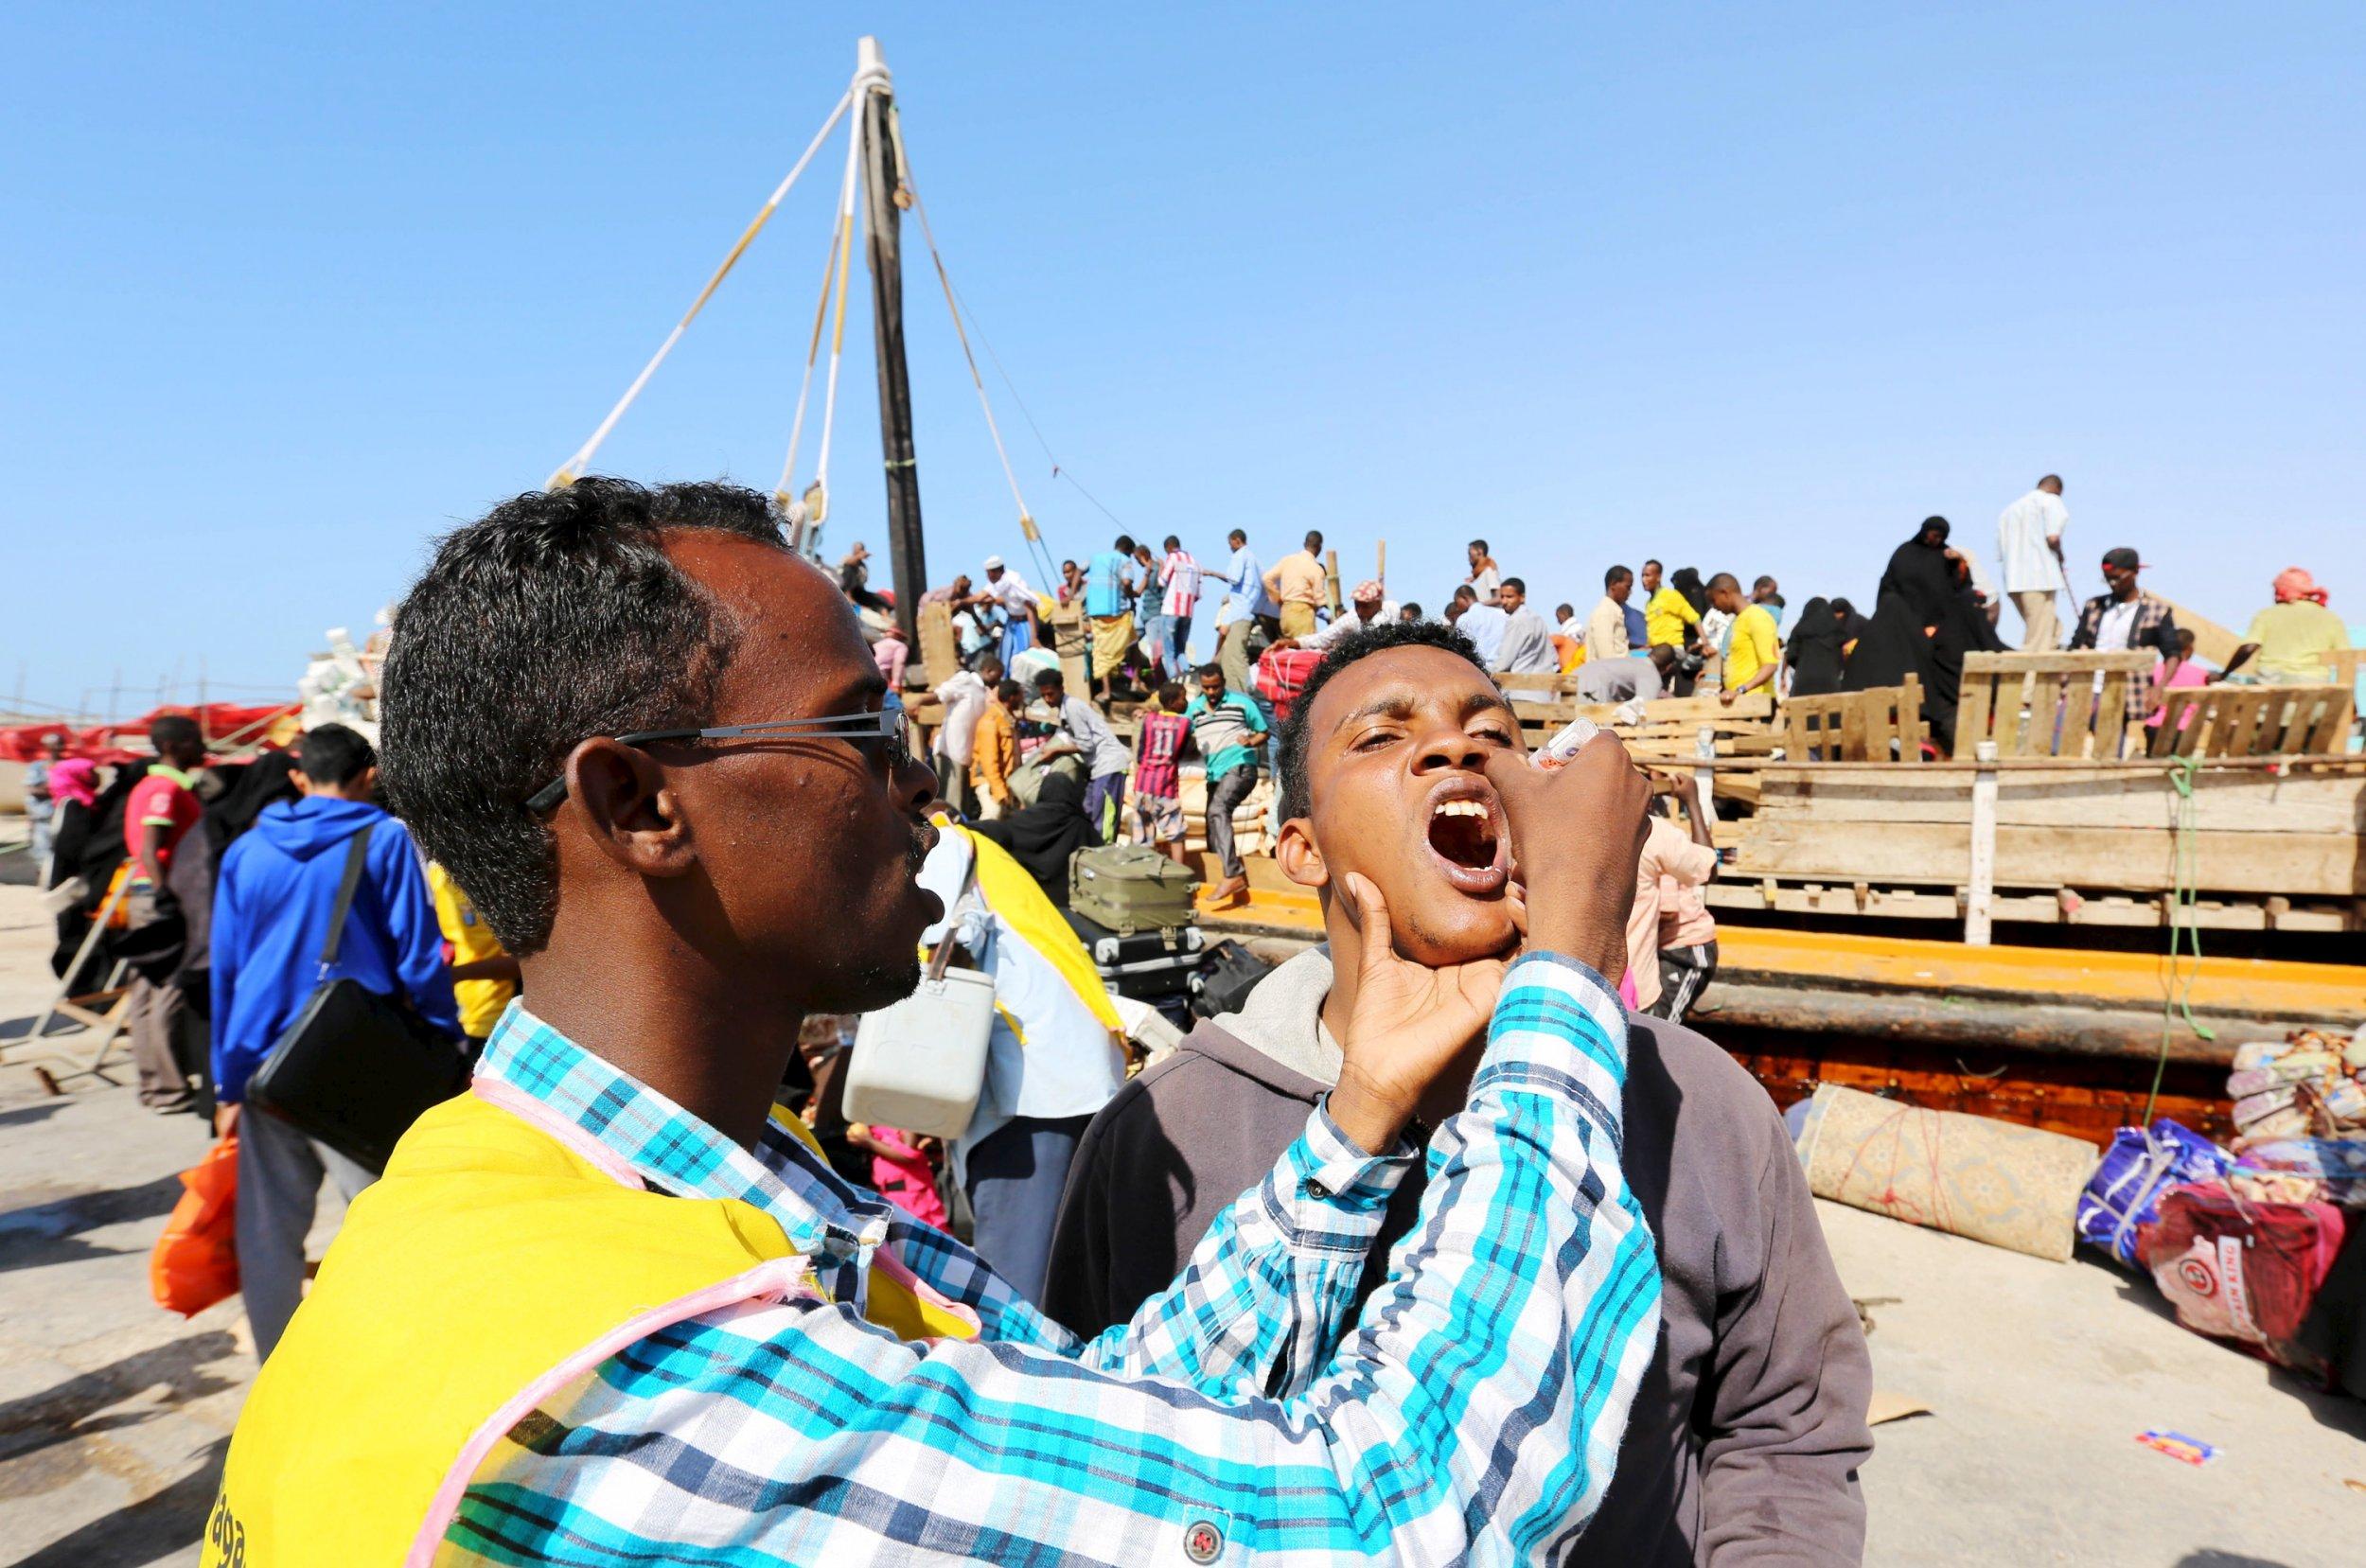 Yemen refugees in Somalia